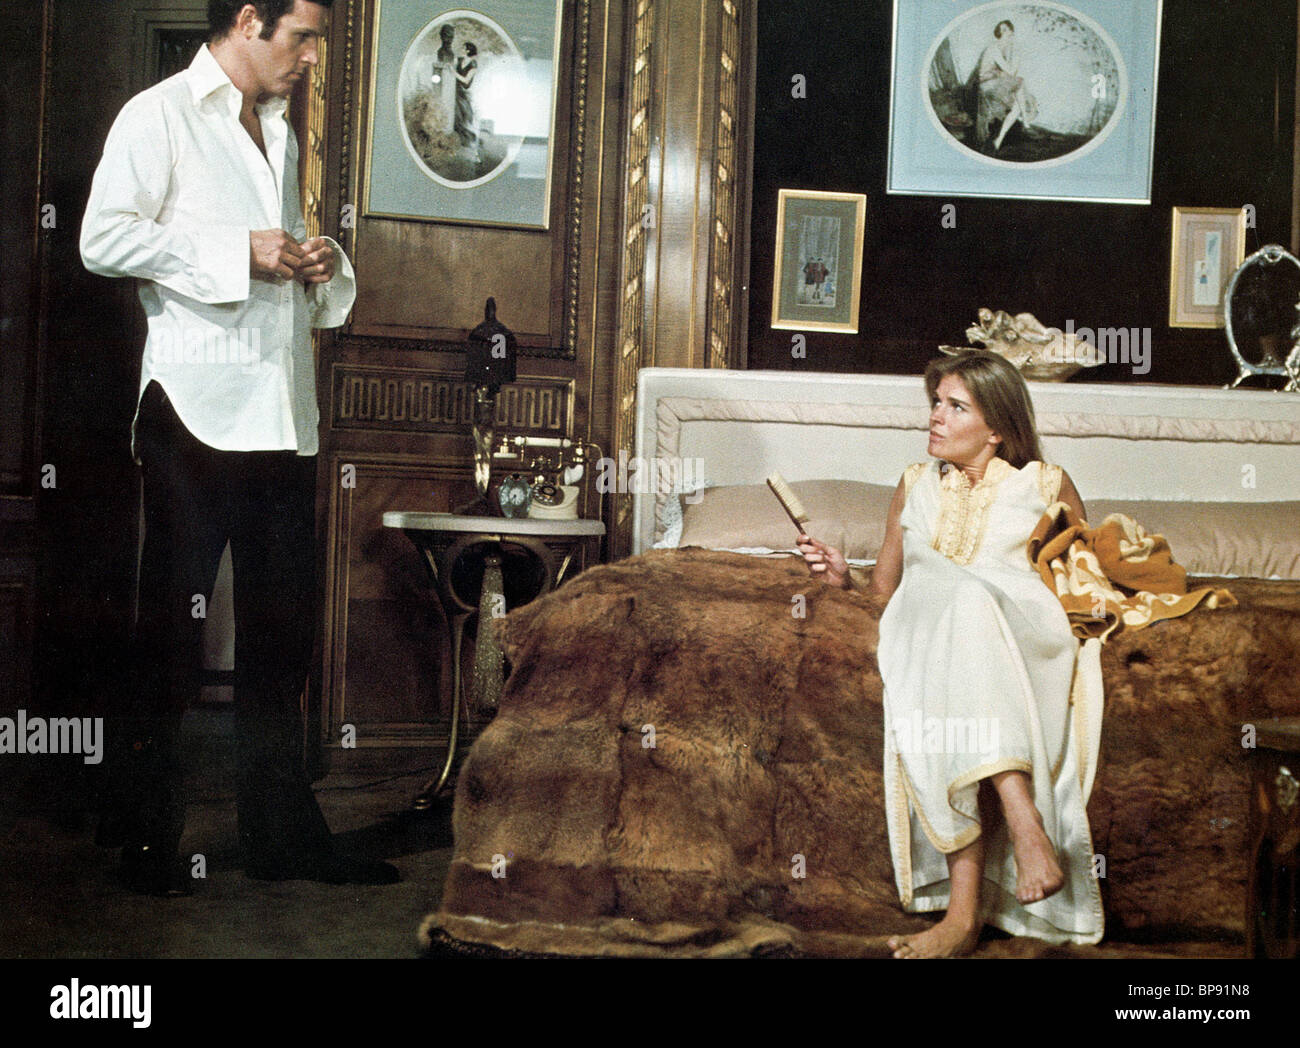 CHARLES GRODIN, CANDICE BERGEN, 11 HARROWHOUSE, 1974 - Stock Image